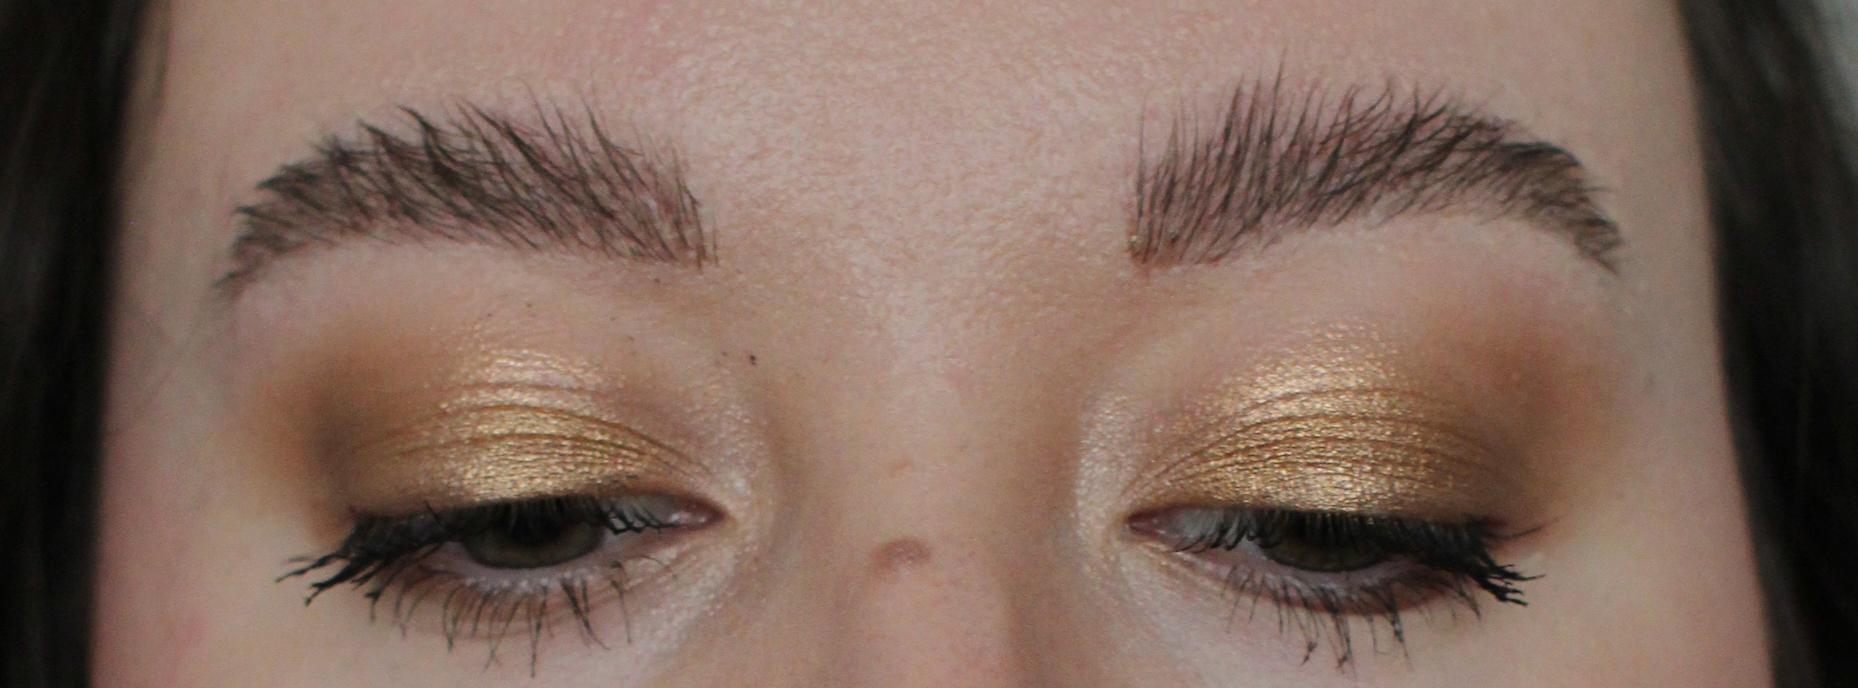 Saippuakulmat eli soap brows: lopputulos